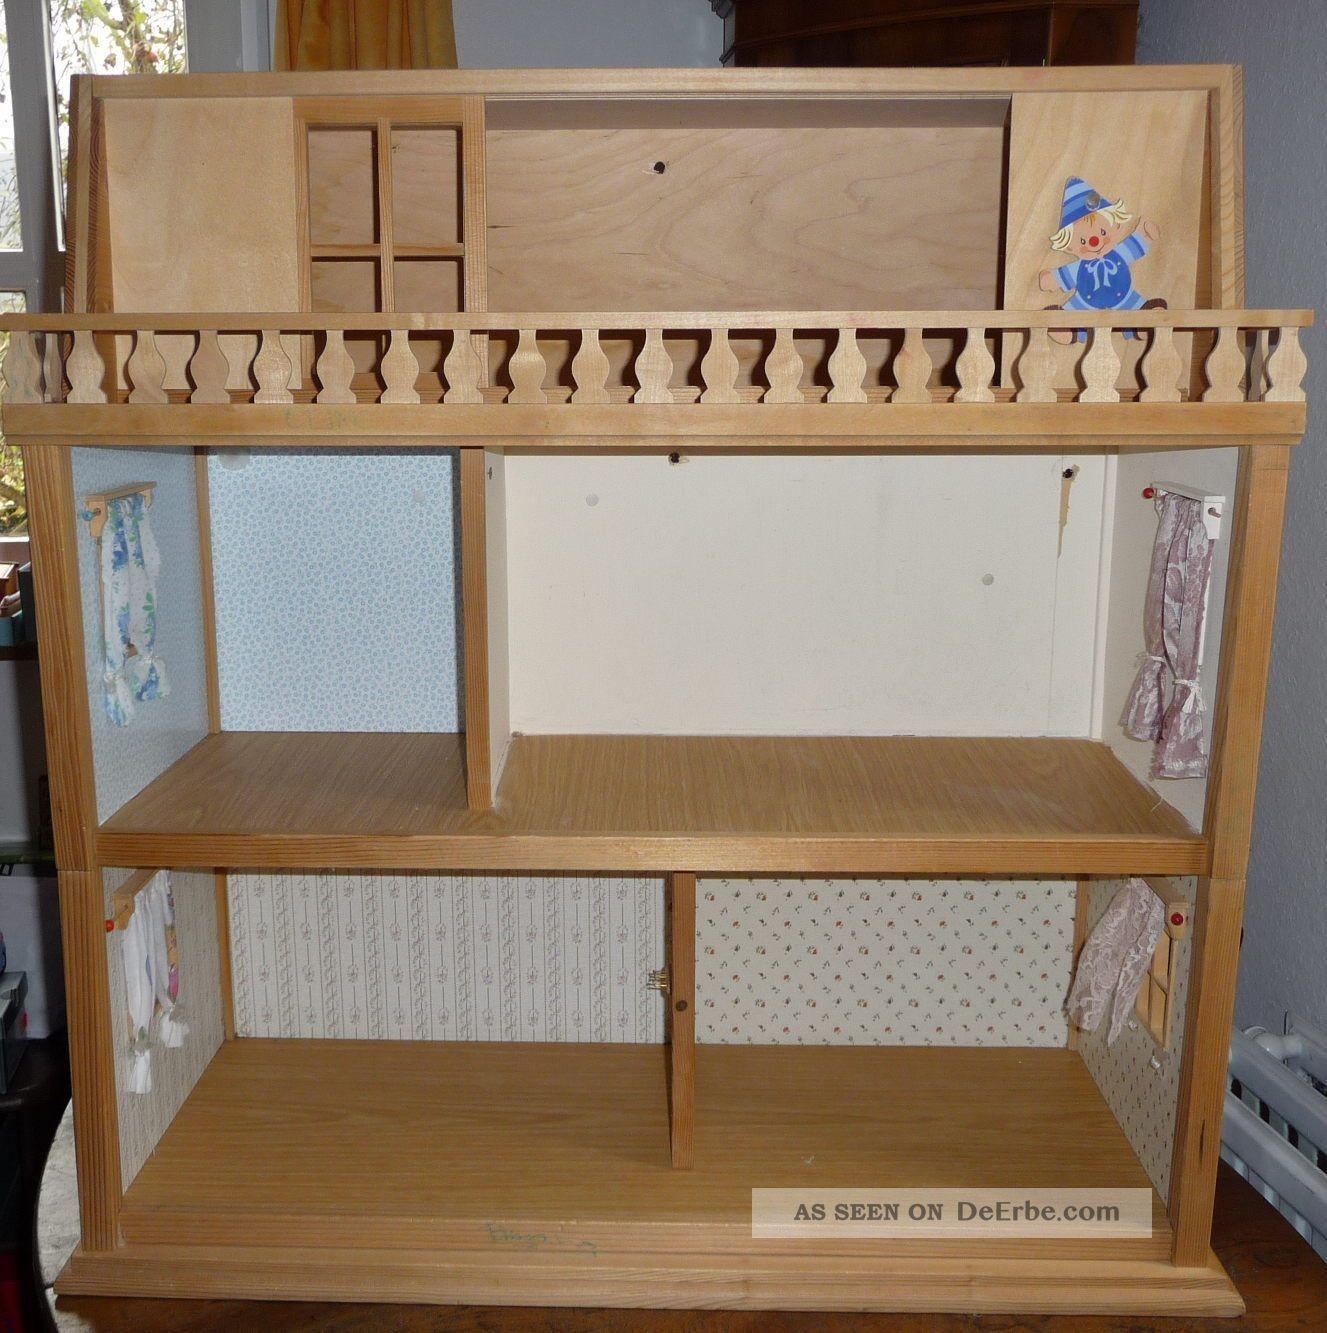 dora kuhn puppenstube puppenhaus puppenk che holz schlafzimmer 3 stockwerke 1970. Black Bedroom Furniture Sets. Home Design Ideas